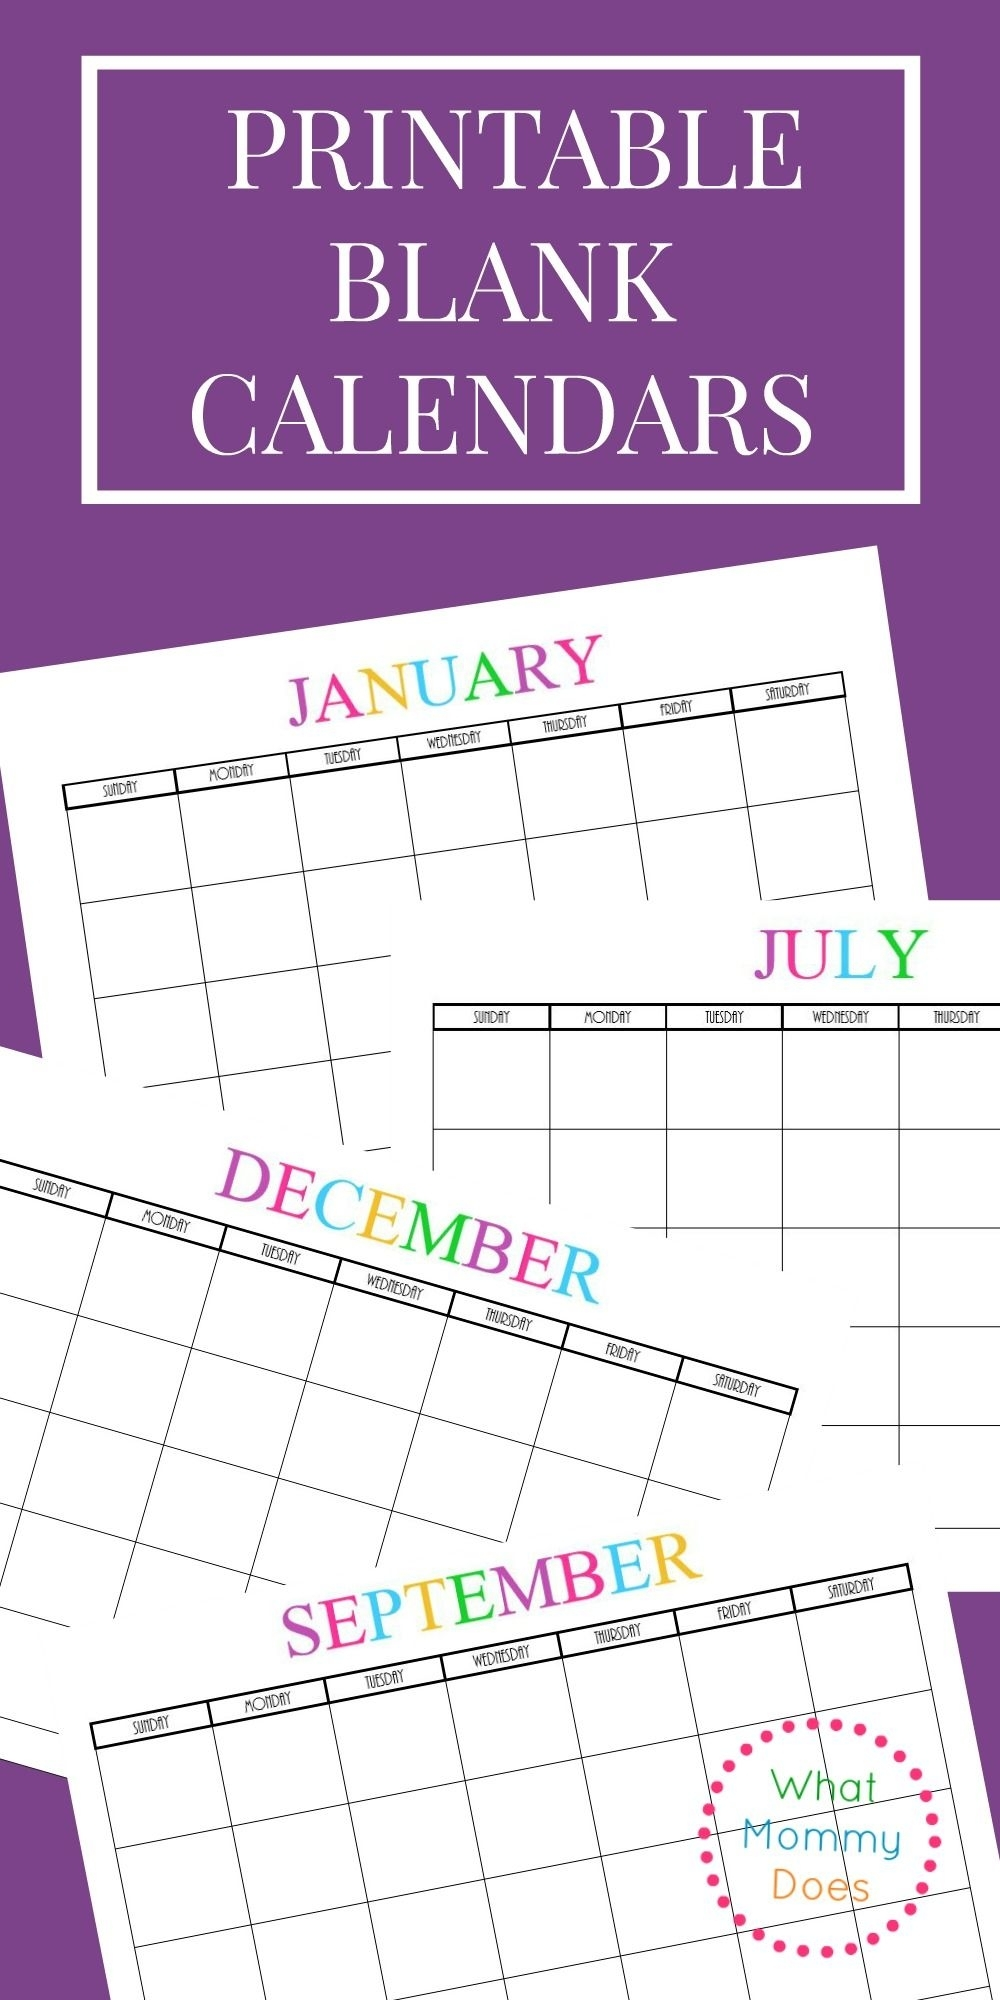 Free Printable Blank Monthly Calendars - 2019, 2020, 2021, 2022+   Blank Monthly Calendar